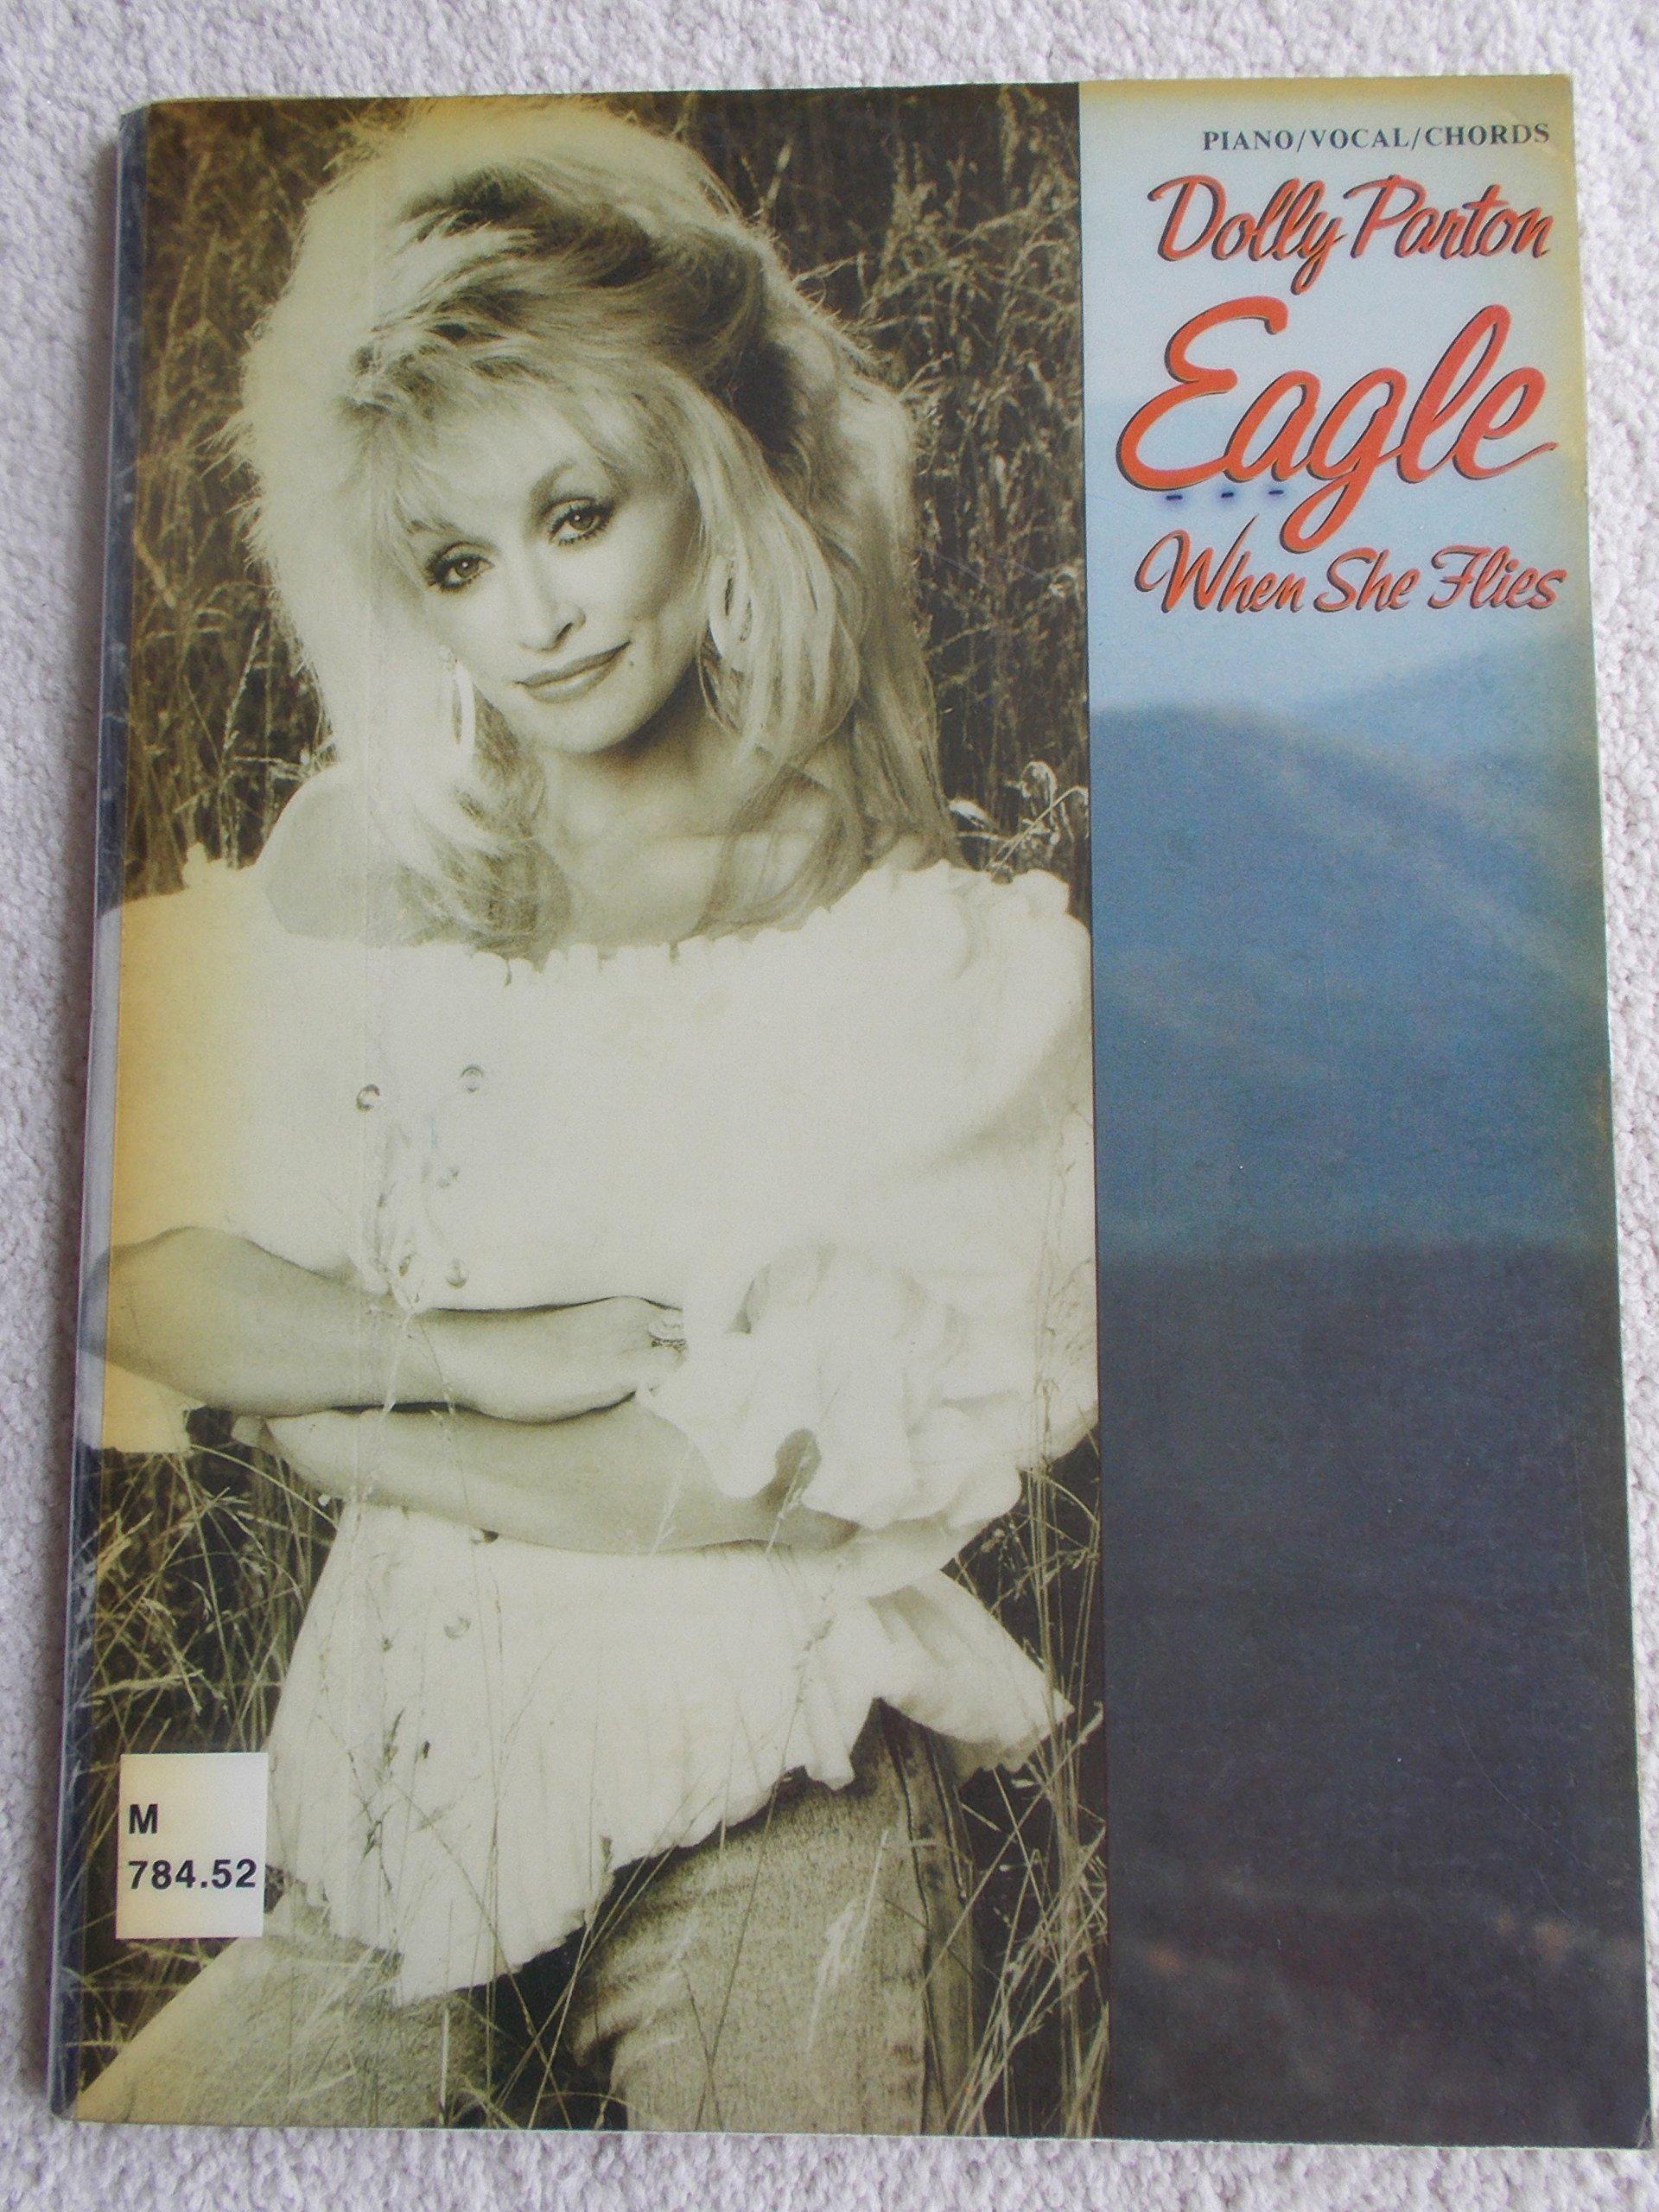 Dolly Parton Eagle When She Flies Sheet Music Booklet Pianovocal